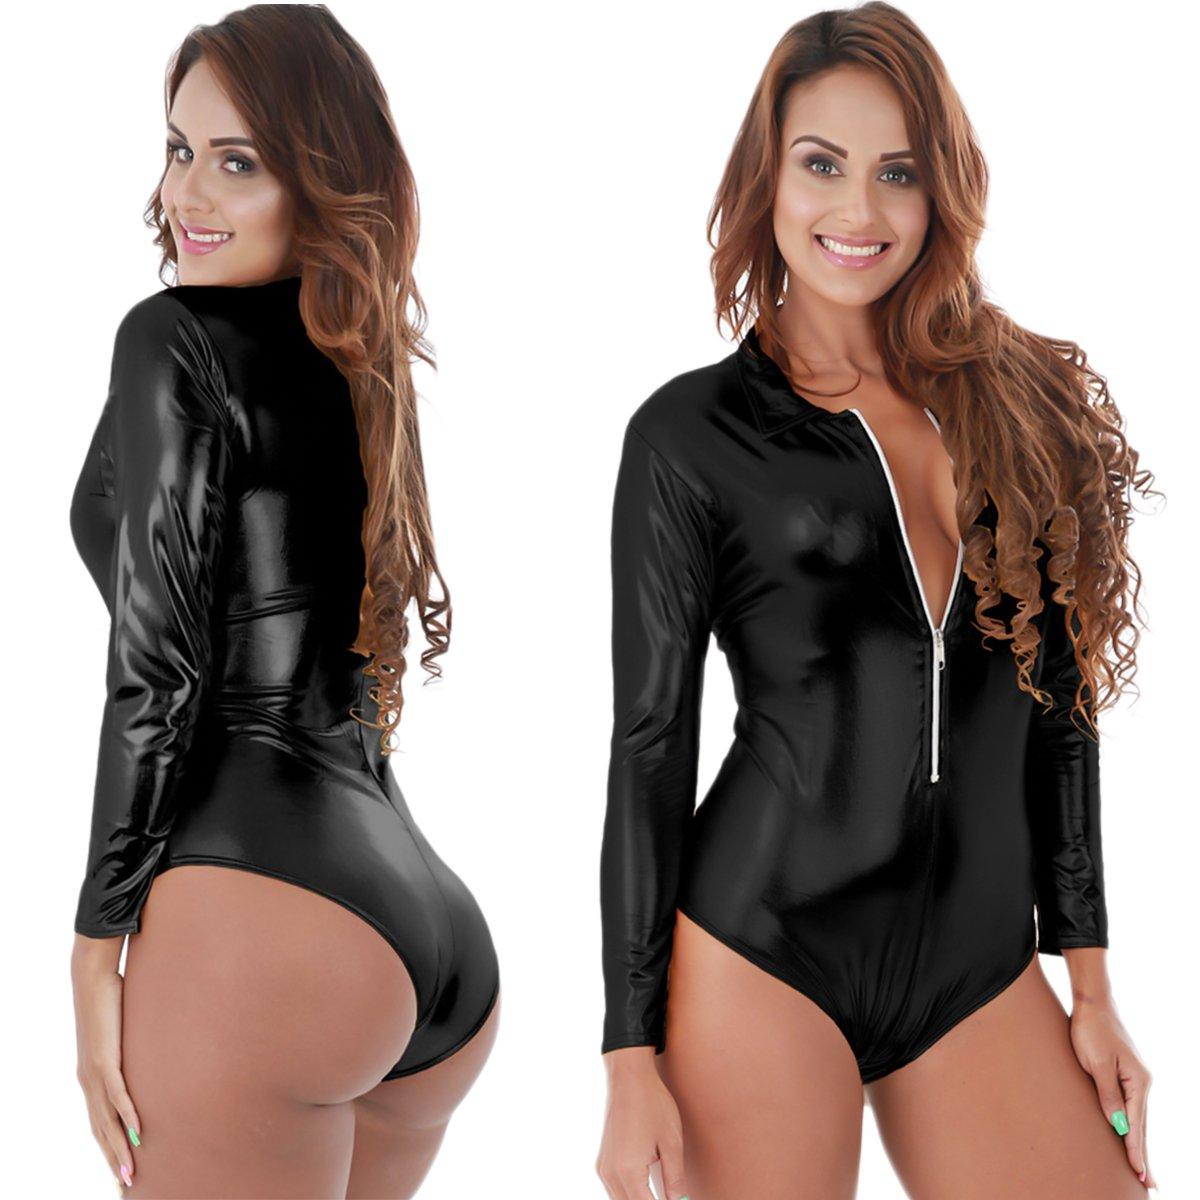 Womens Sexy Faux Leather Long Sleeve Zipper Bodysuit Clubwear Bodycon  Leotard Teddy Romper Jumpsuit Dance Unitard Tops at Amazon Women s Clothing  store  fdb12dee8